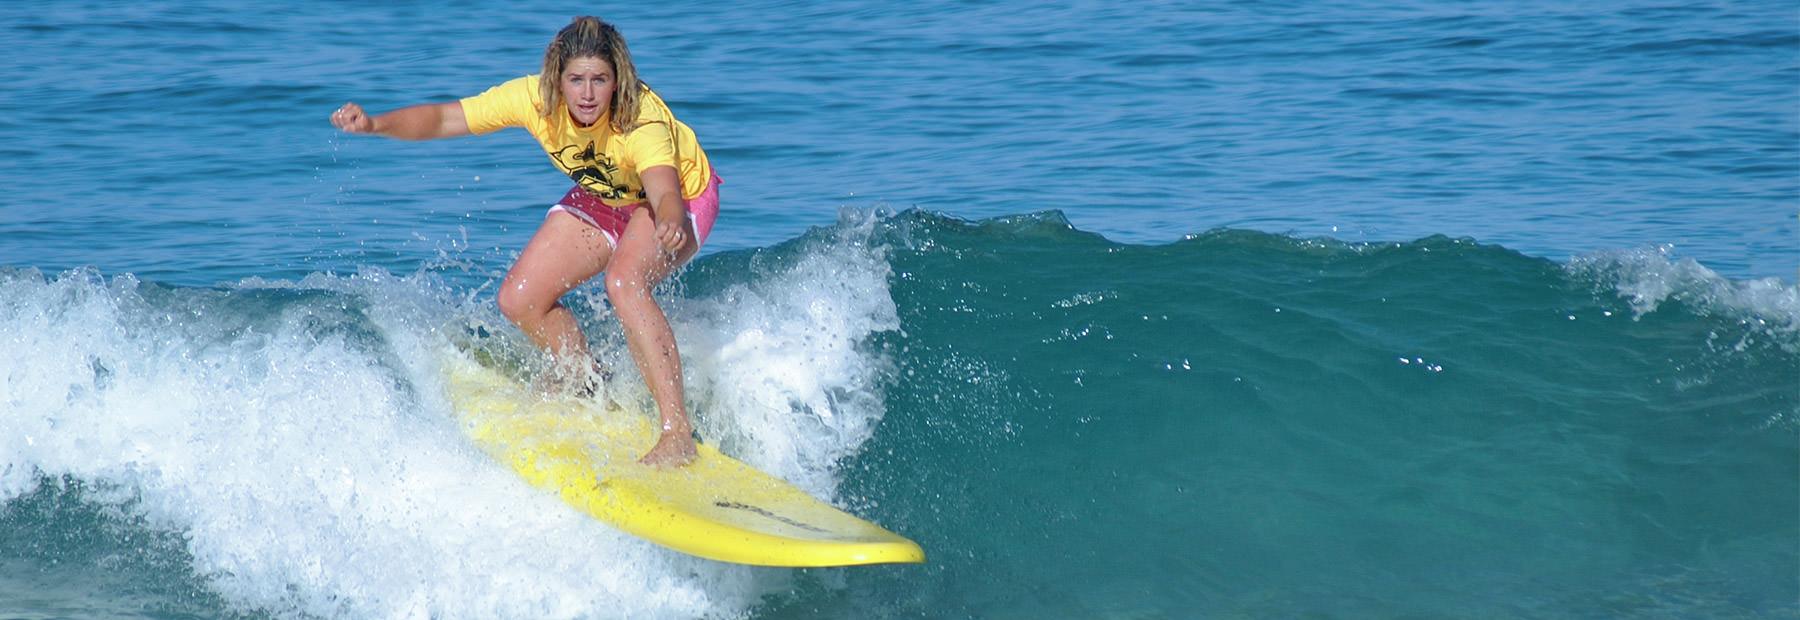 Surf School Perth Scarborough Beach beginners Surf lesson